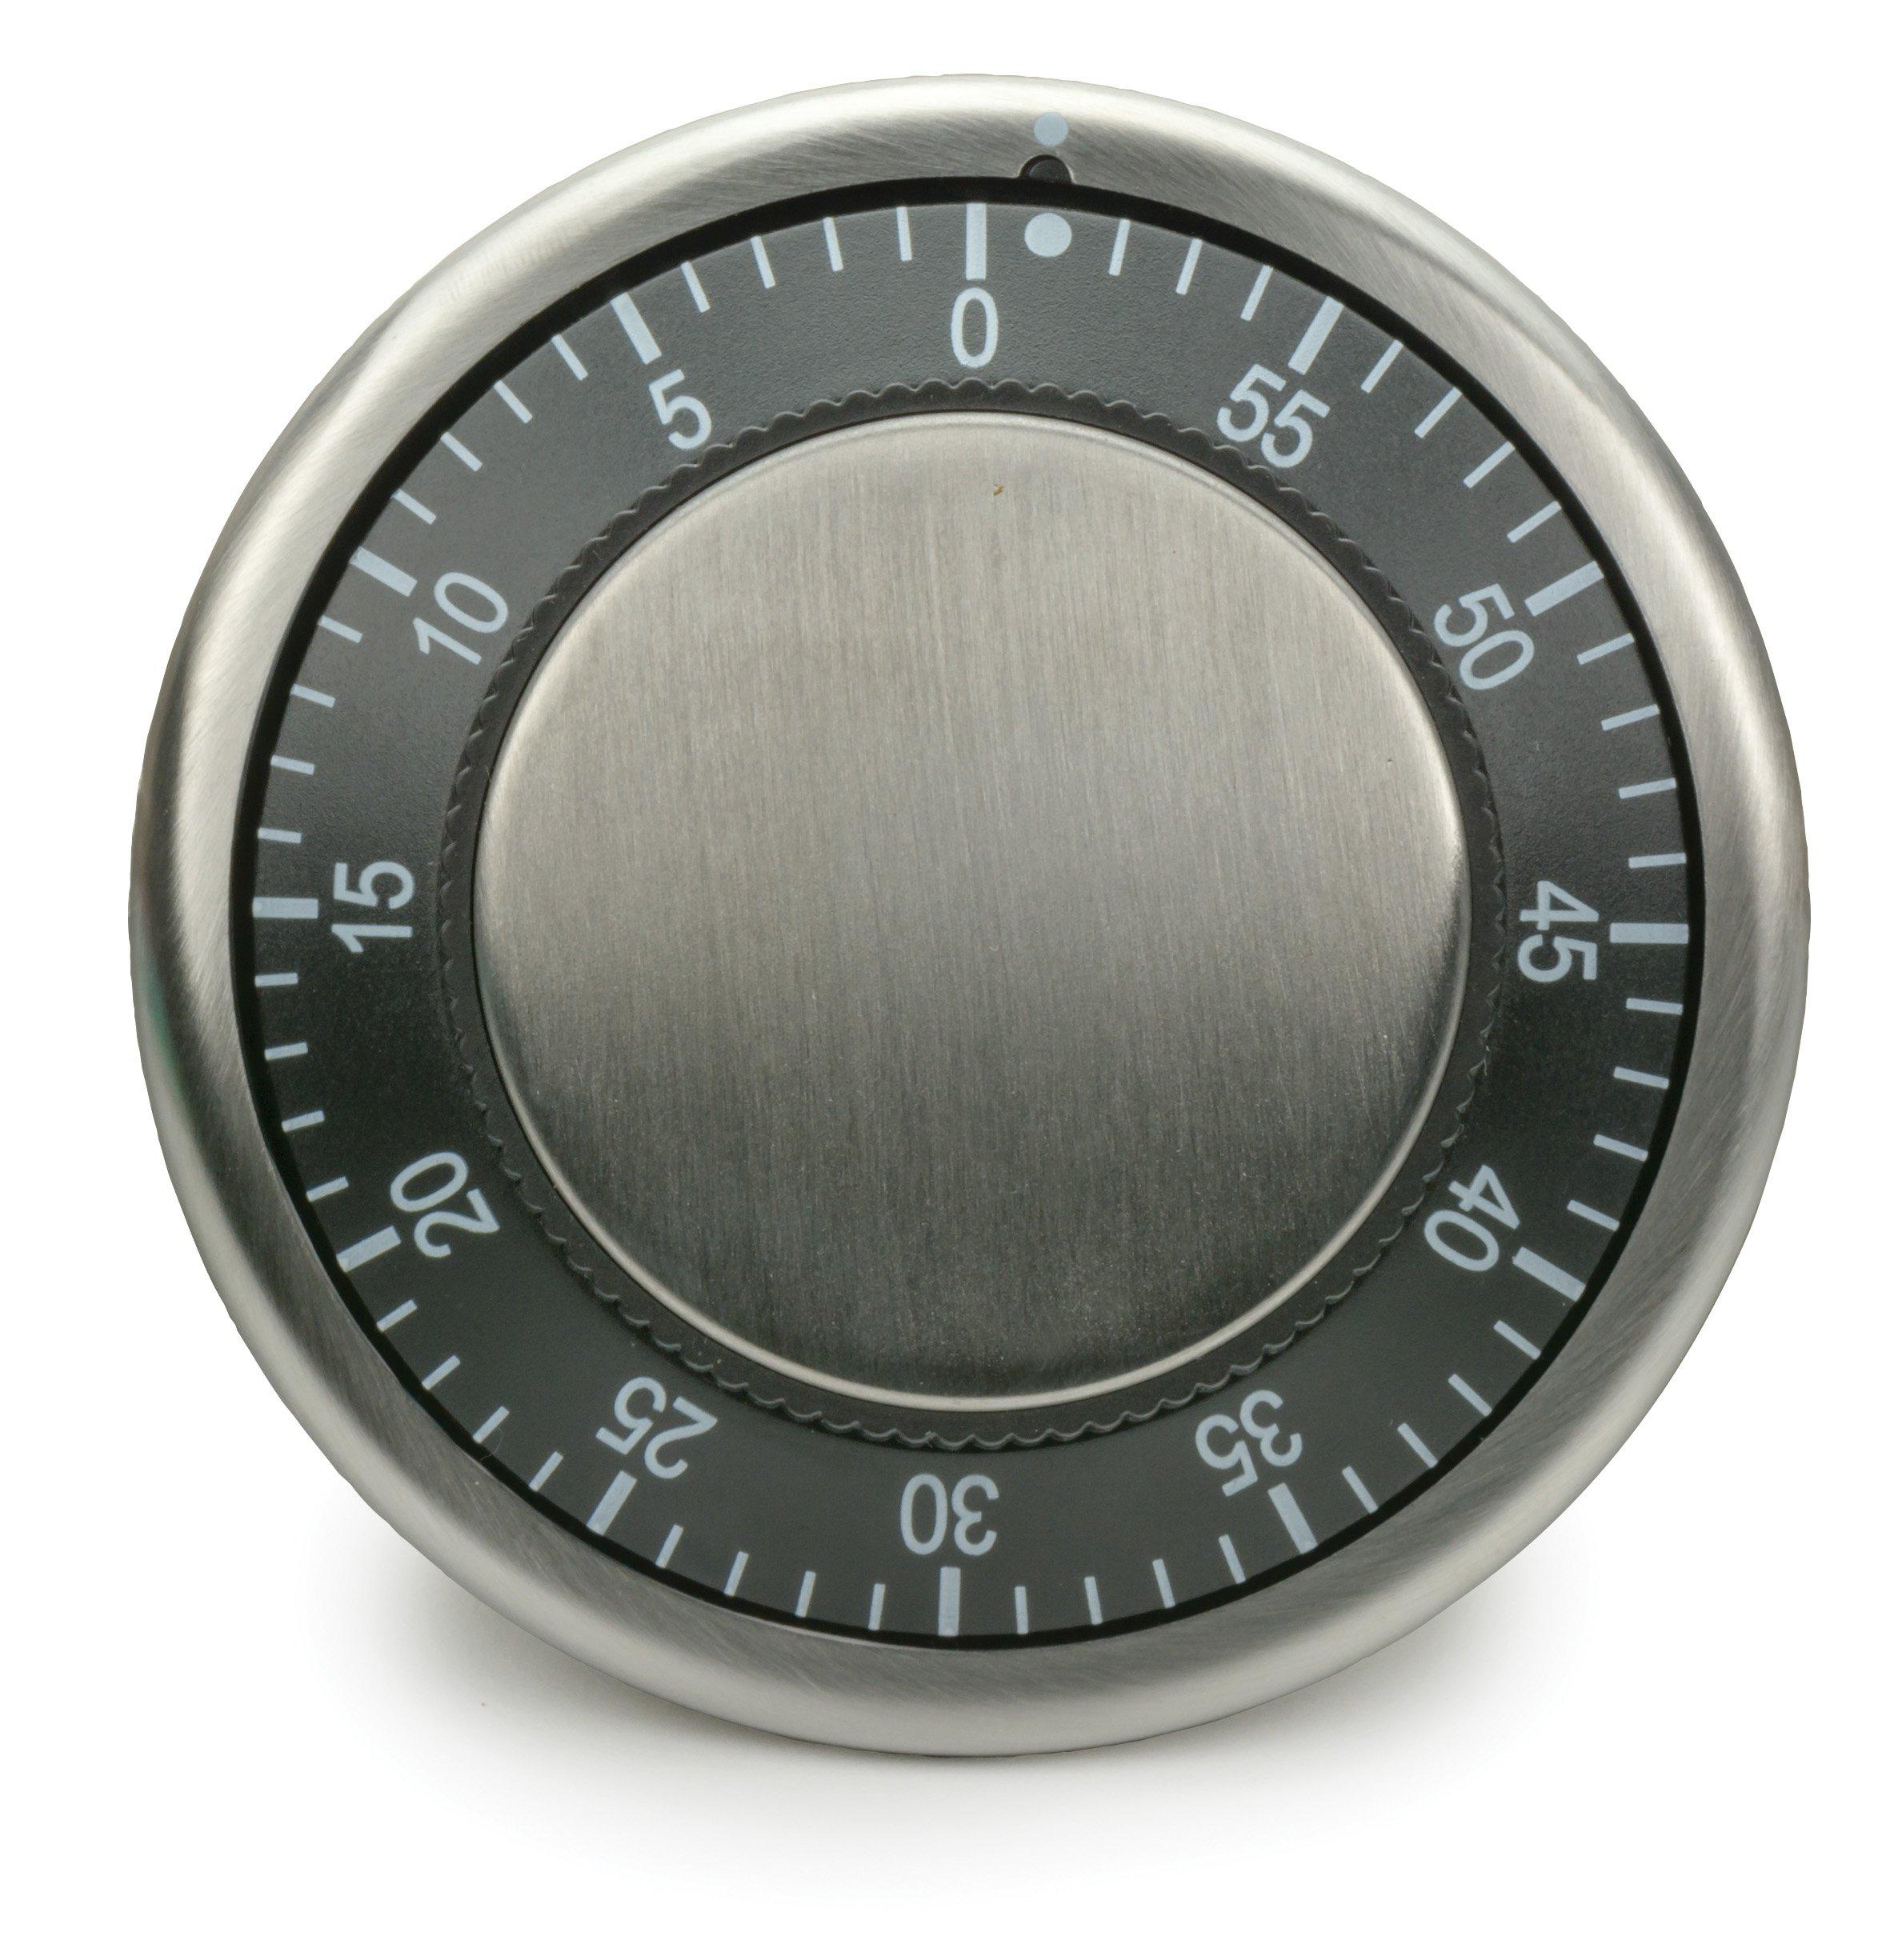 RSVP Endurance Stainless Steel Easy Read Kitchen Timer, Black